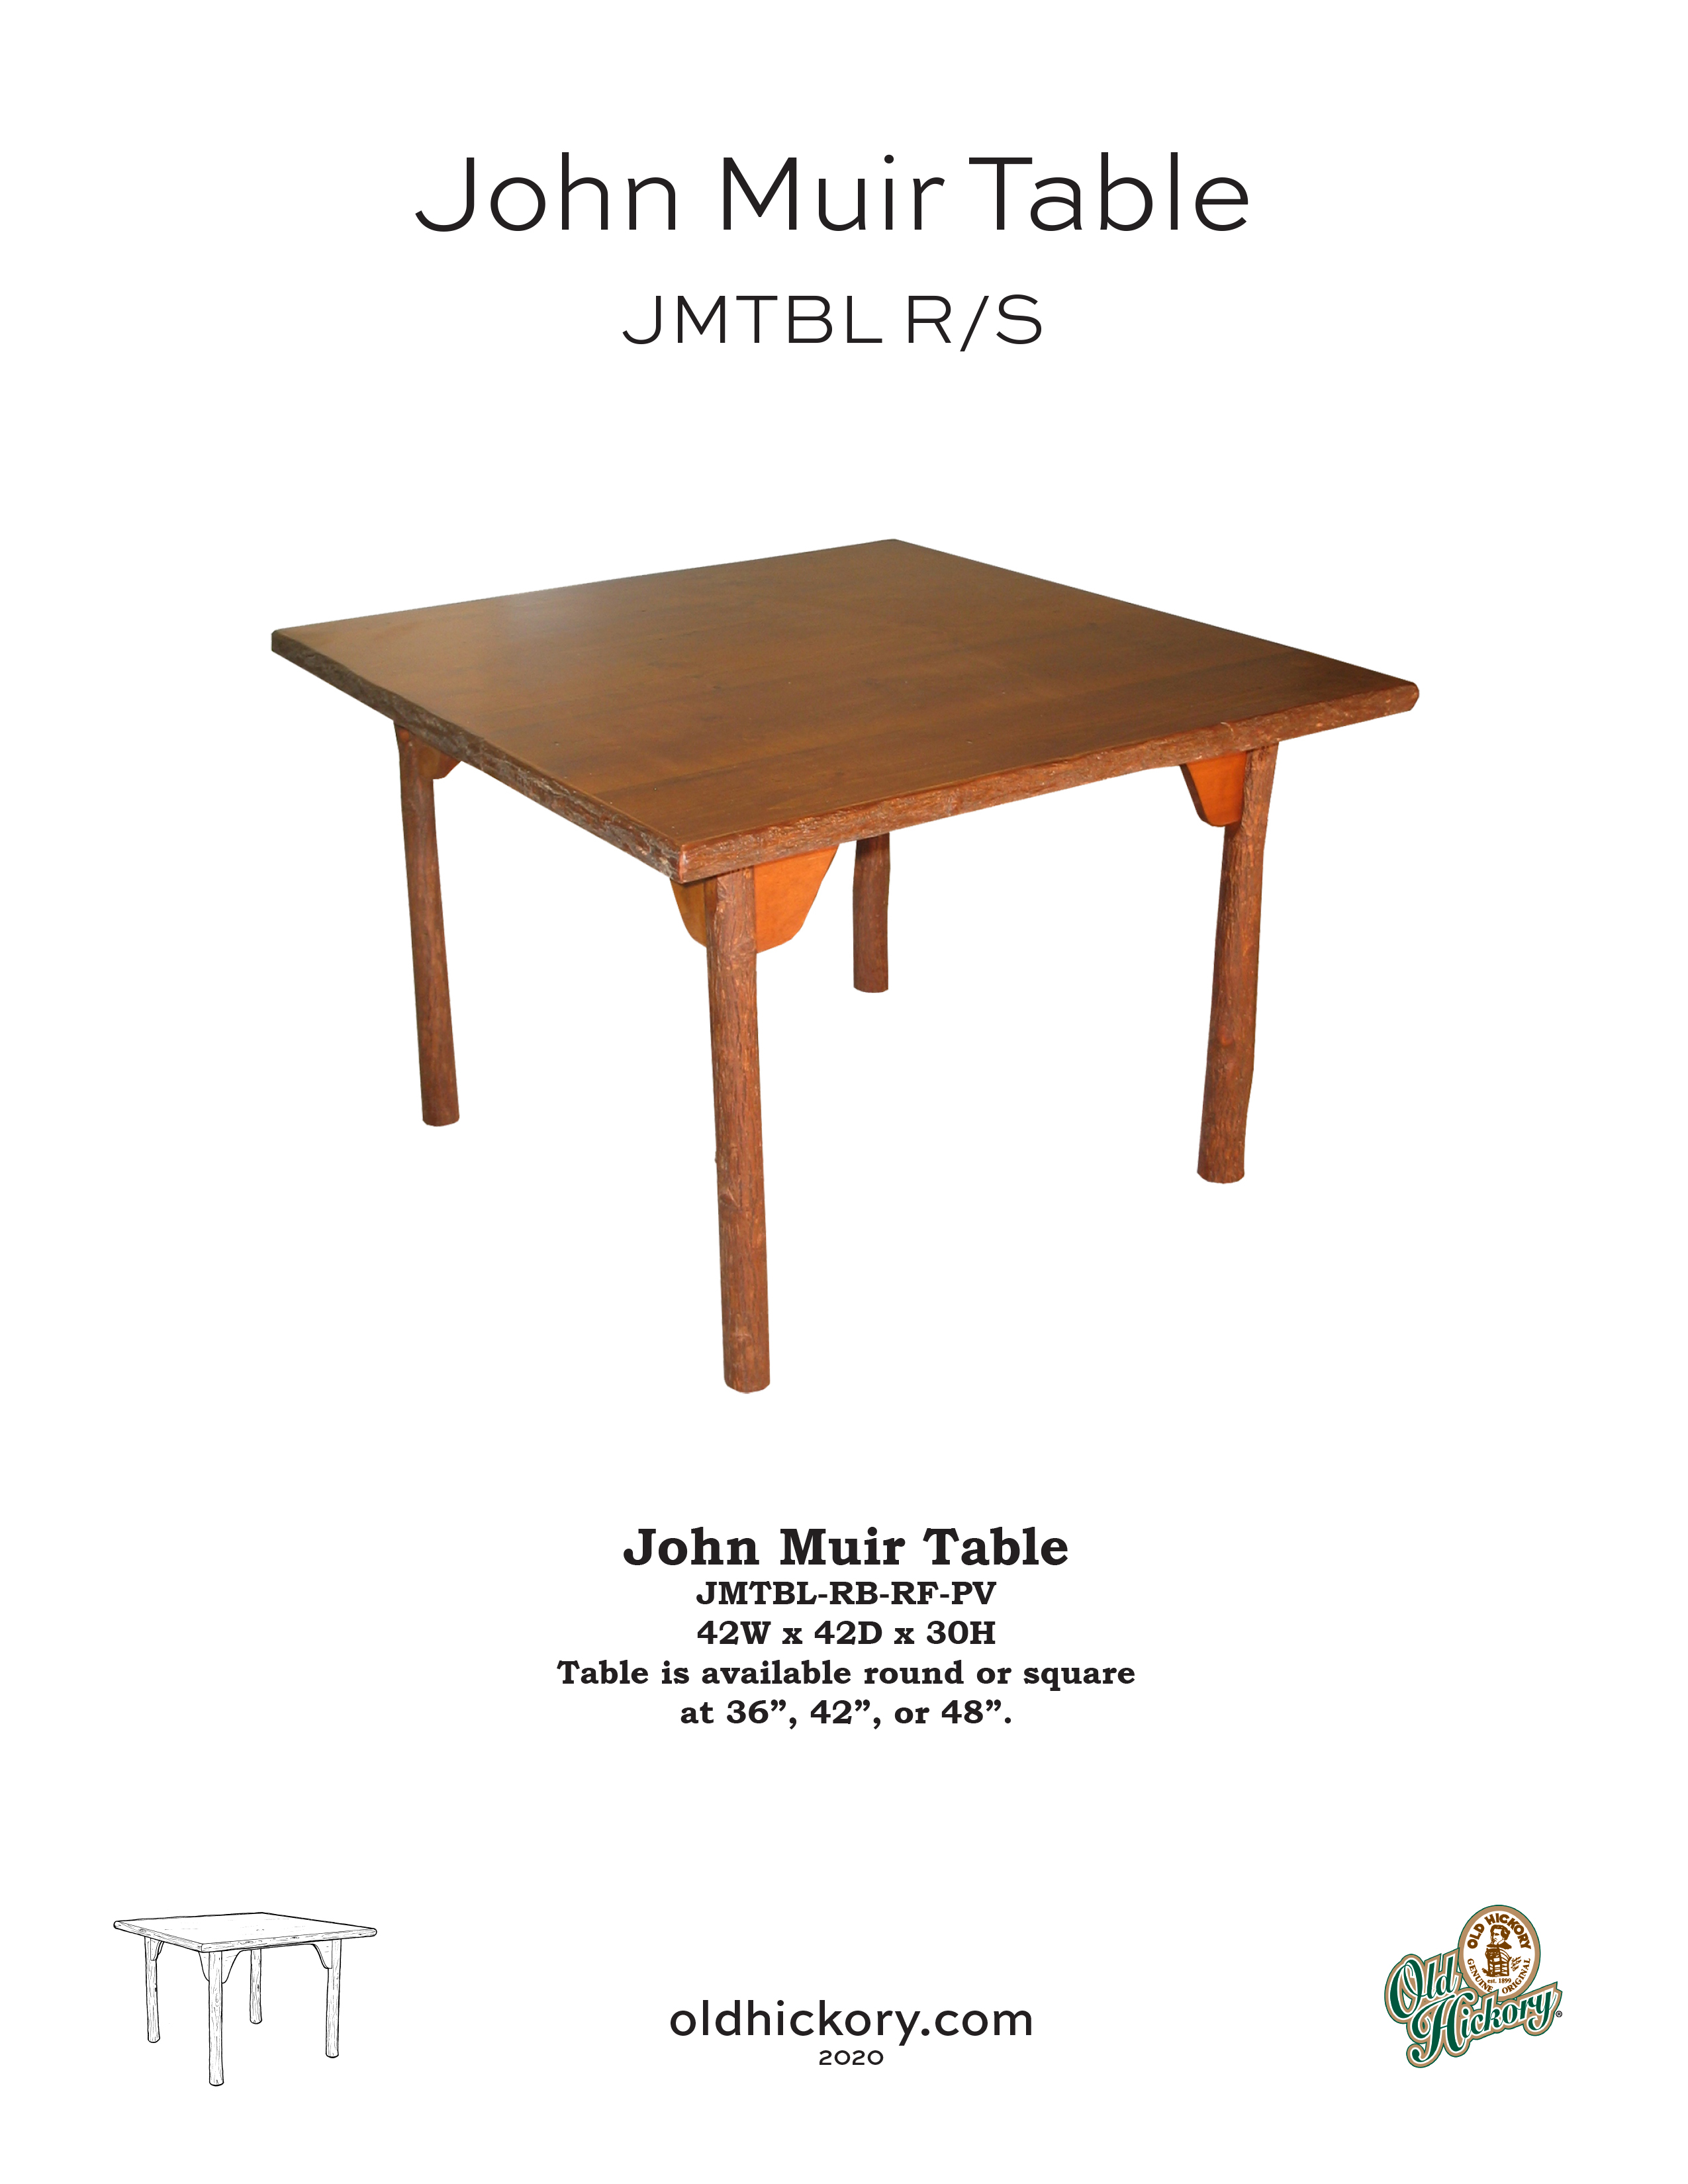 JMTBL